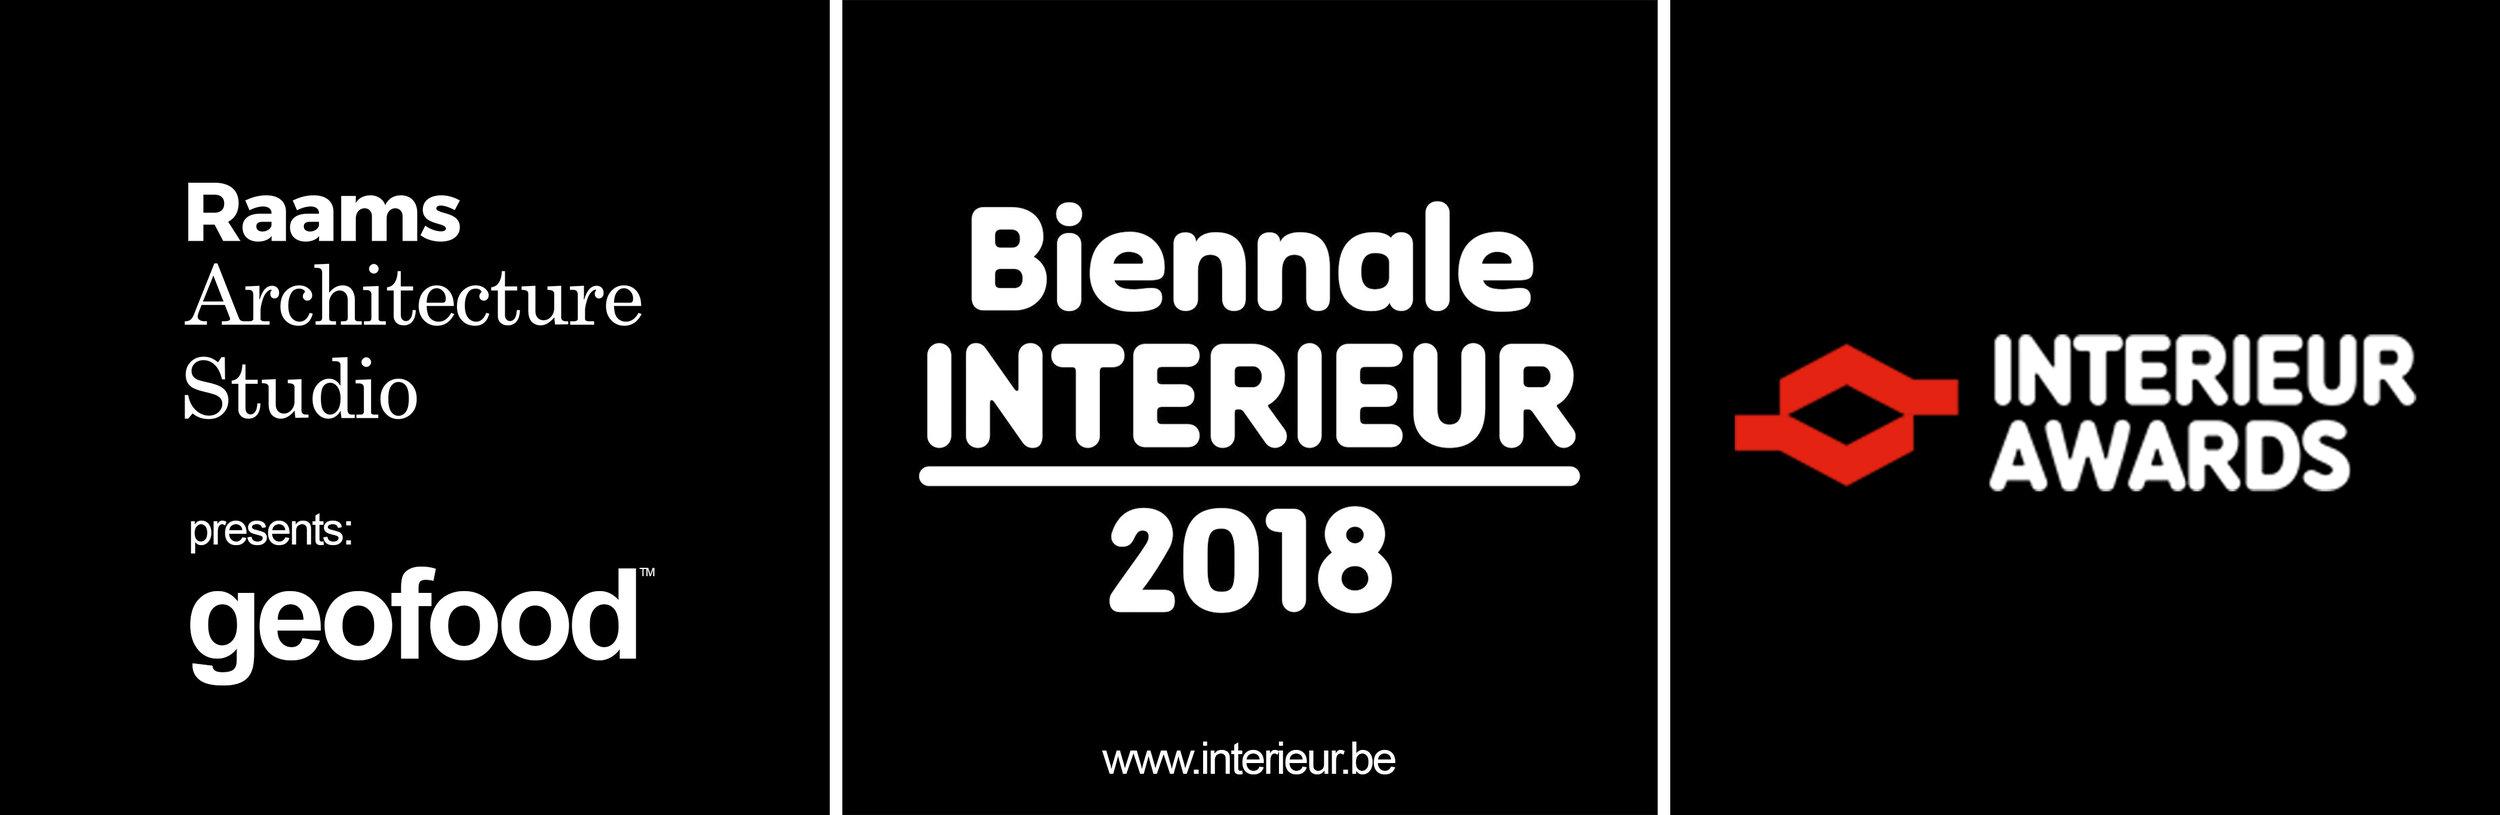 Raams-Architecture-Design-Studio-Geofood-Interieur-Biennale-Kortrijk-Belgium-design-award-restaurant-installation-exhibition-10.jpg